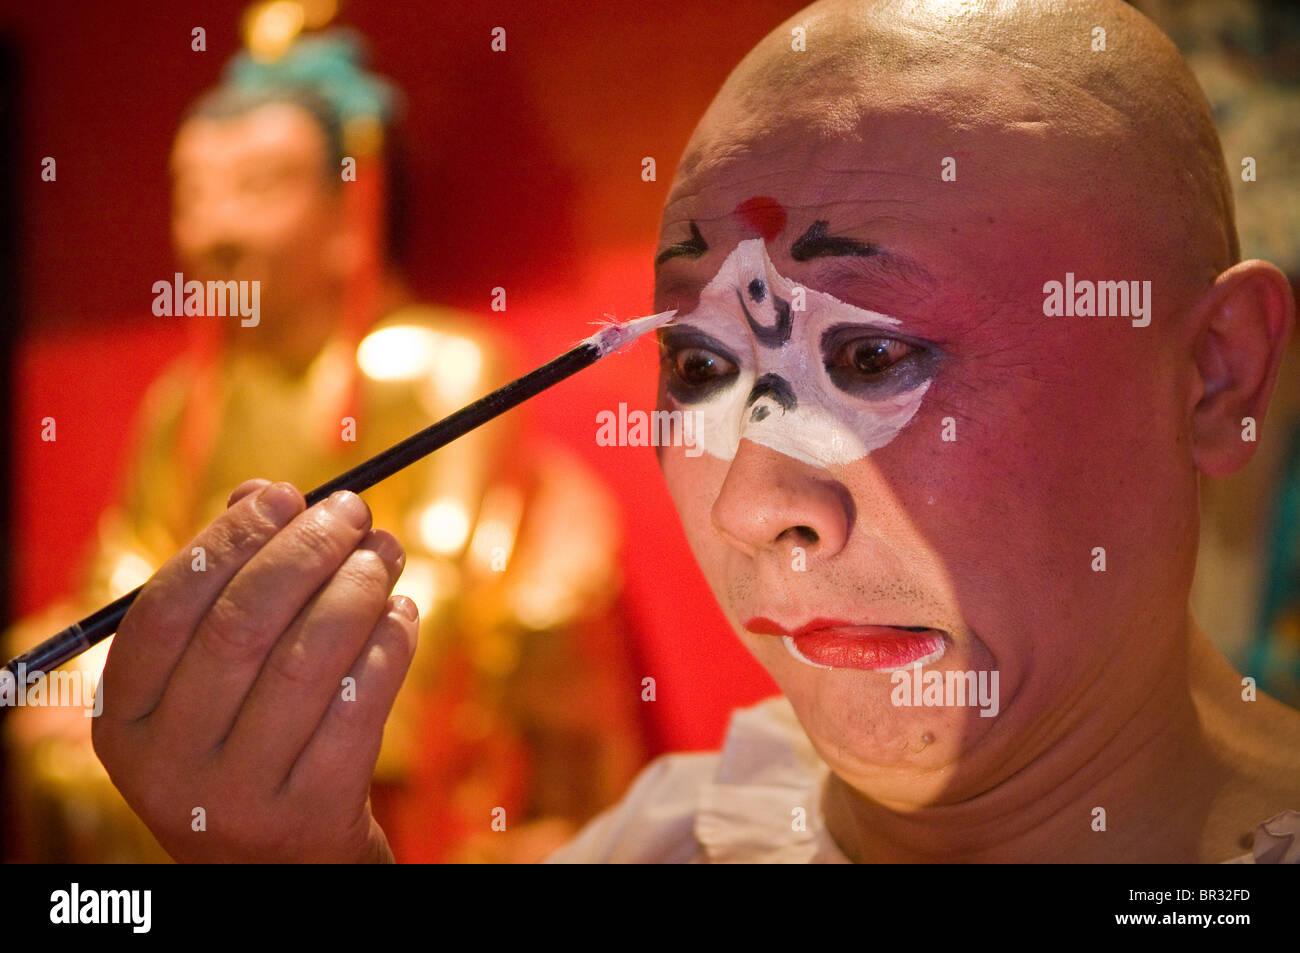 Sichuan opera actor applies makeup before performing at Shufenyayuan Tea House, Chengdu, Sichuan Province, China - Stock Image